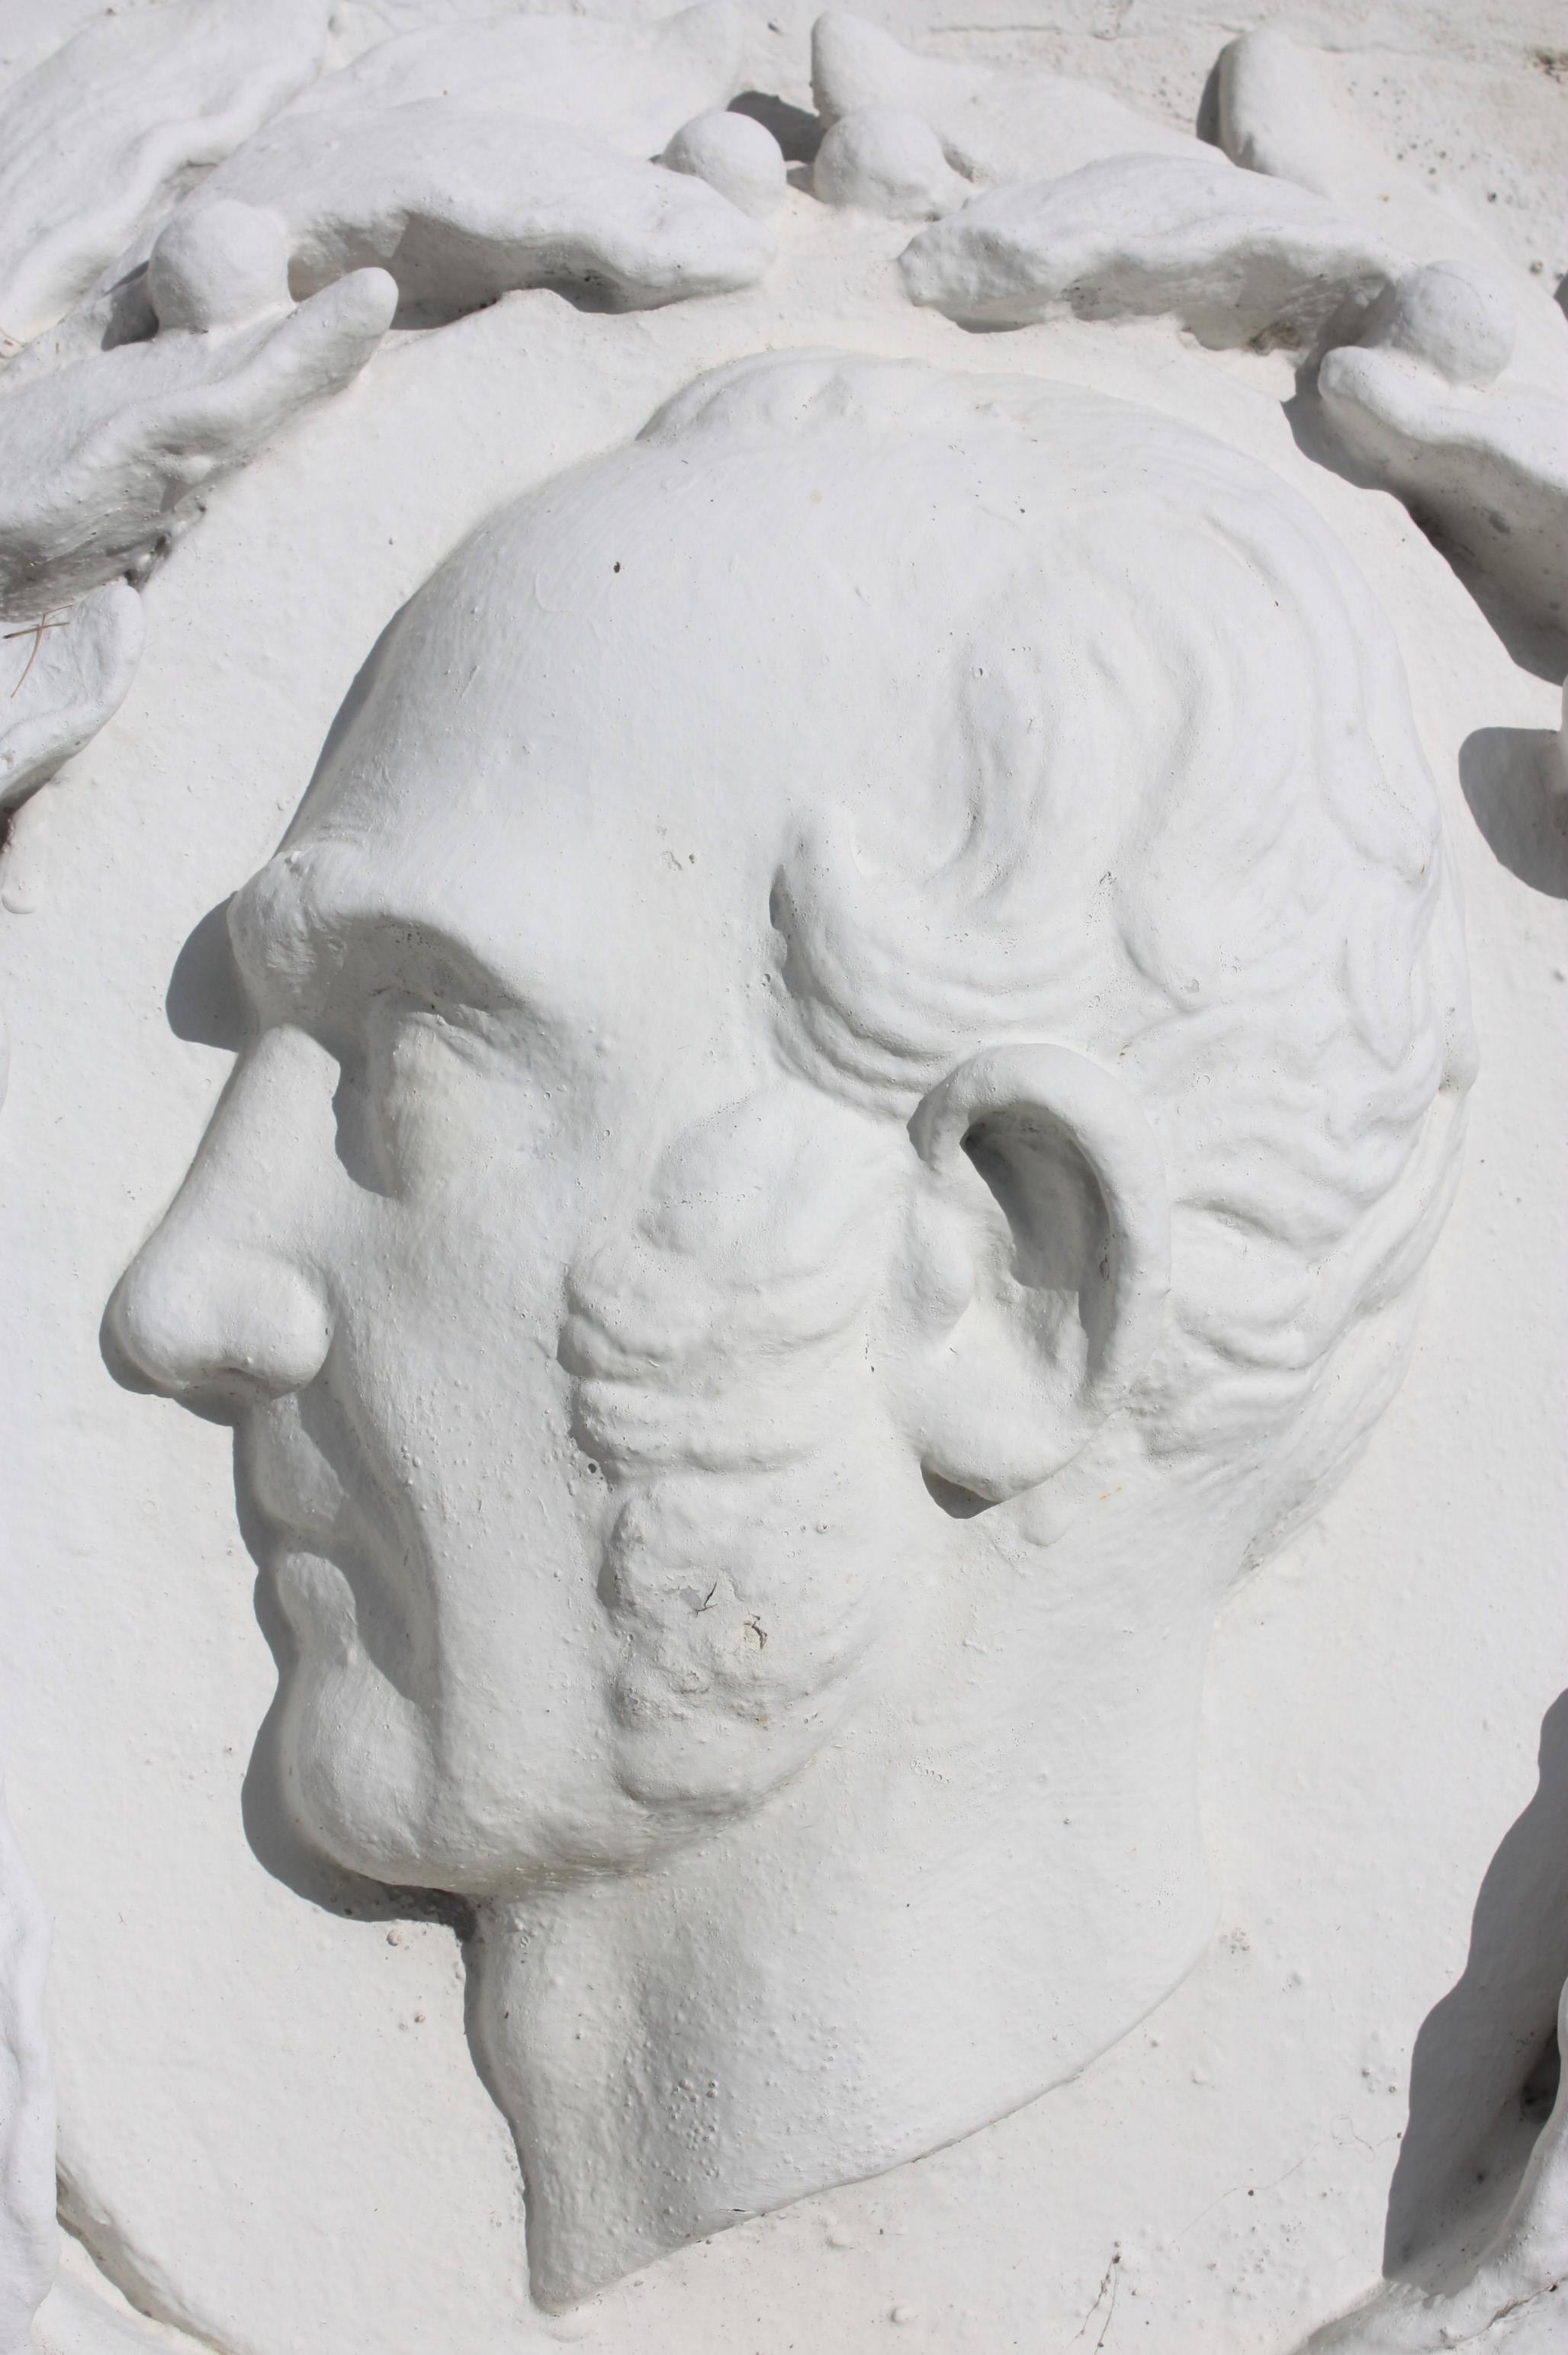 Image of Major Sir Hugh Lyon Playfair from Wikidata